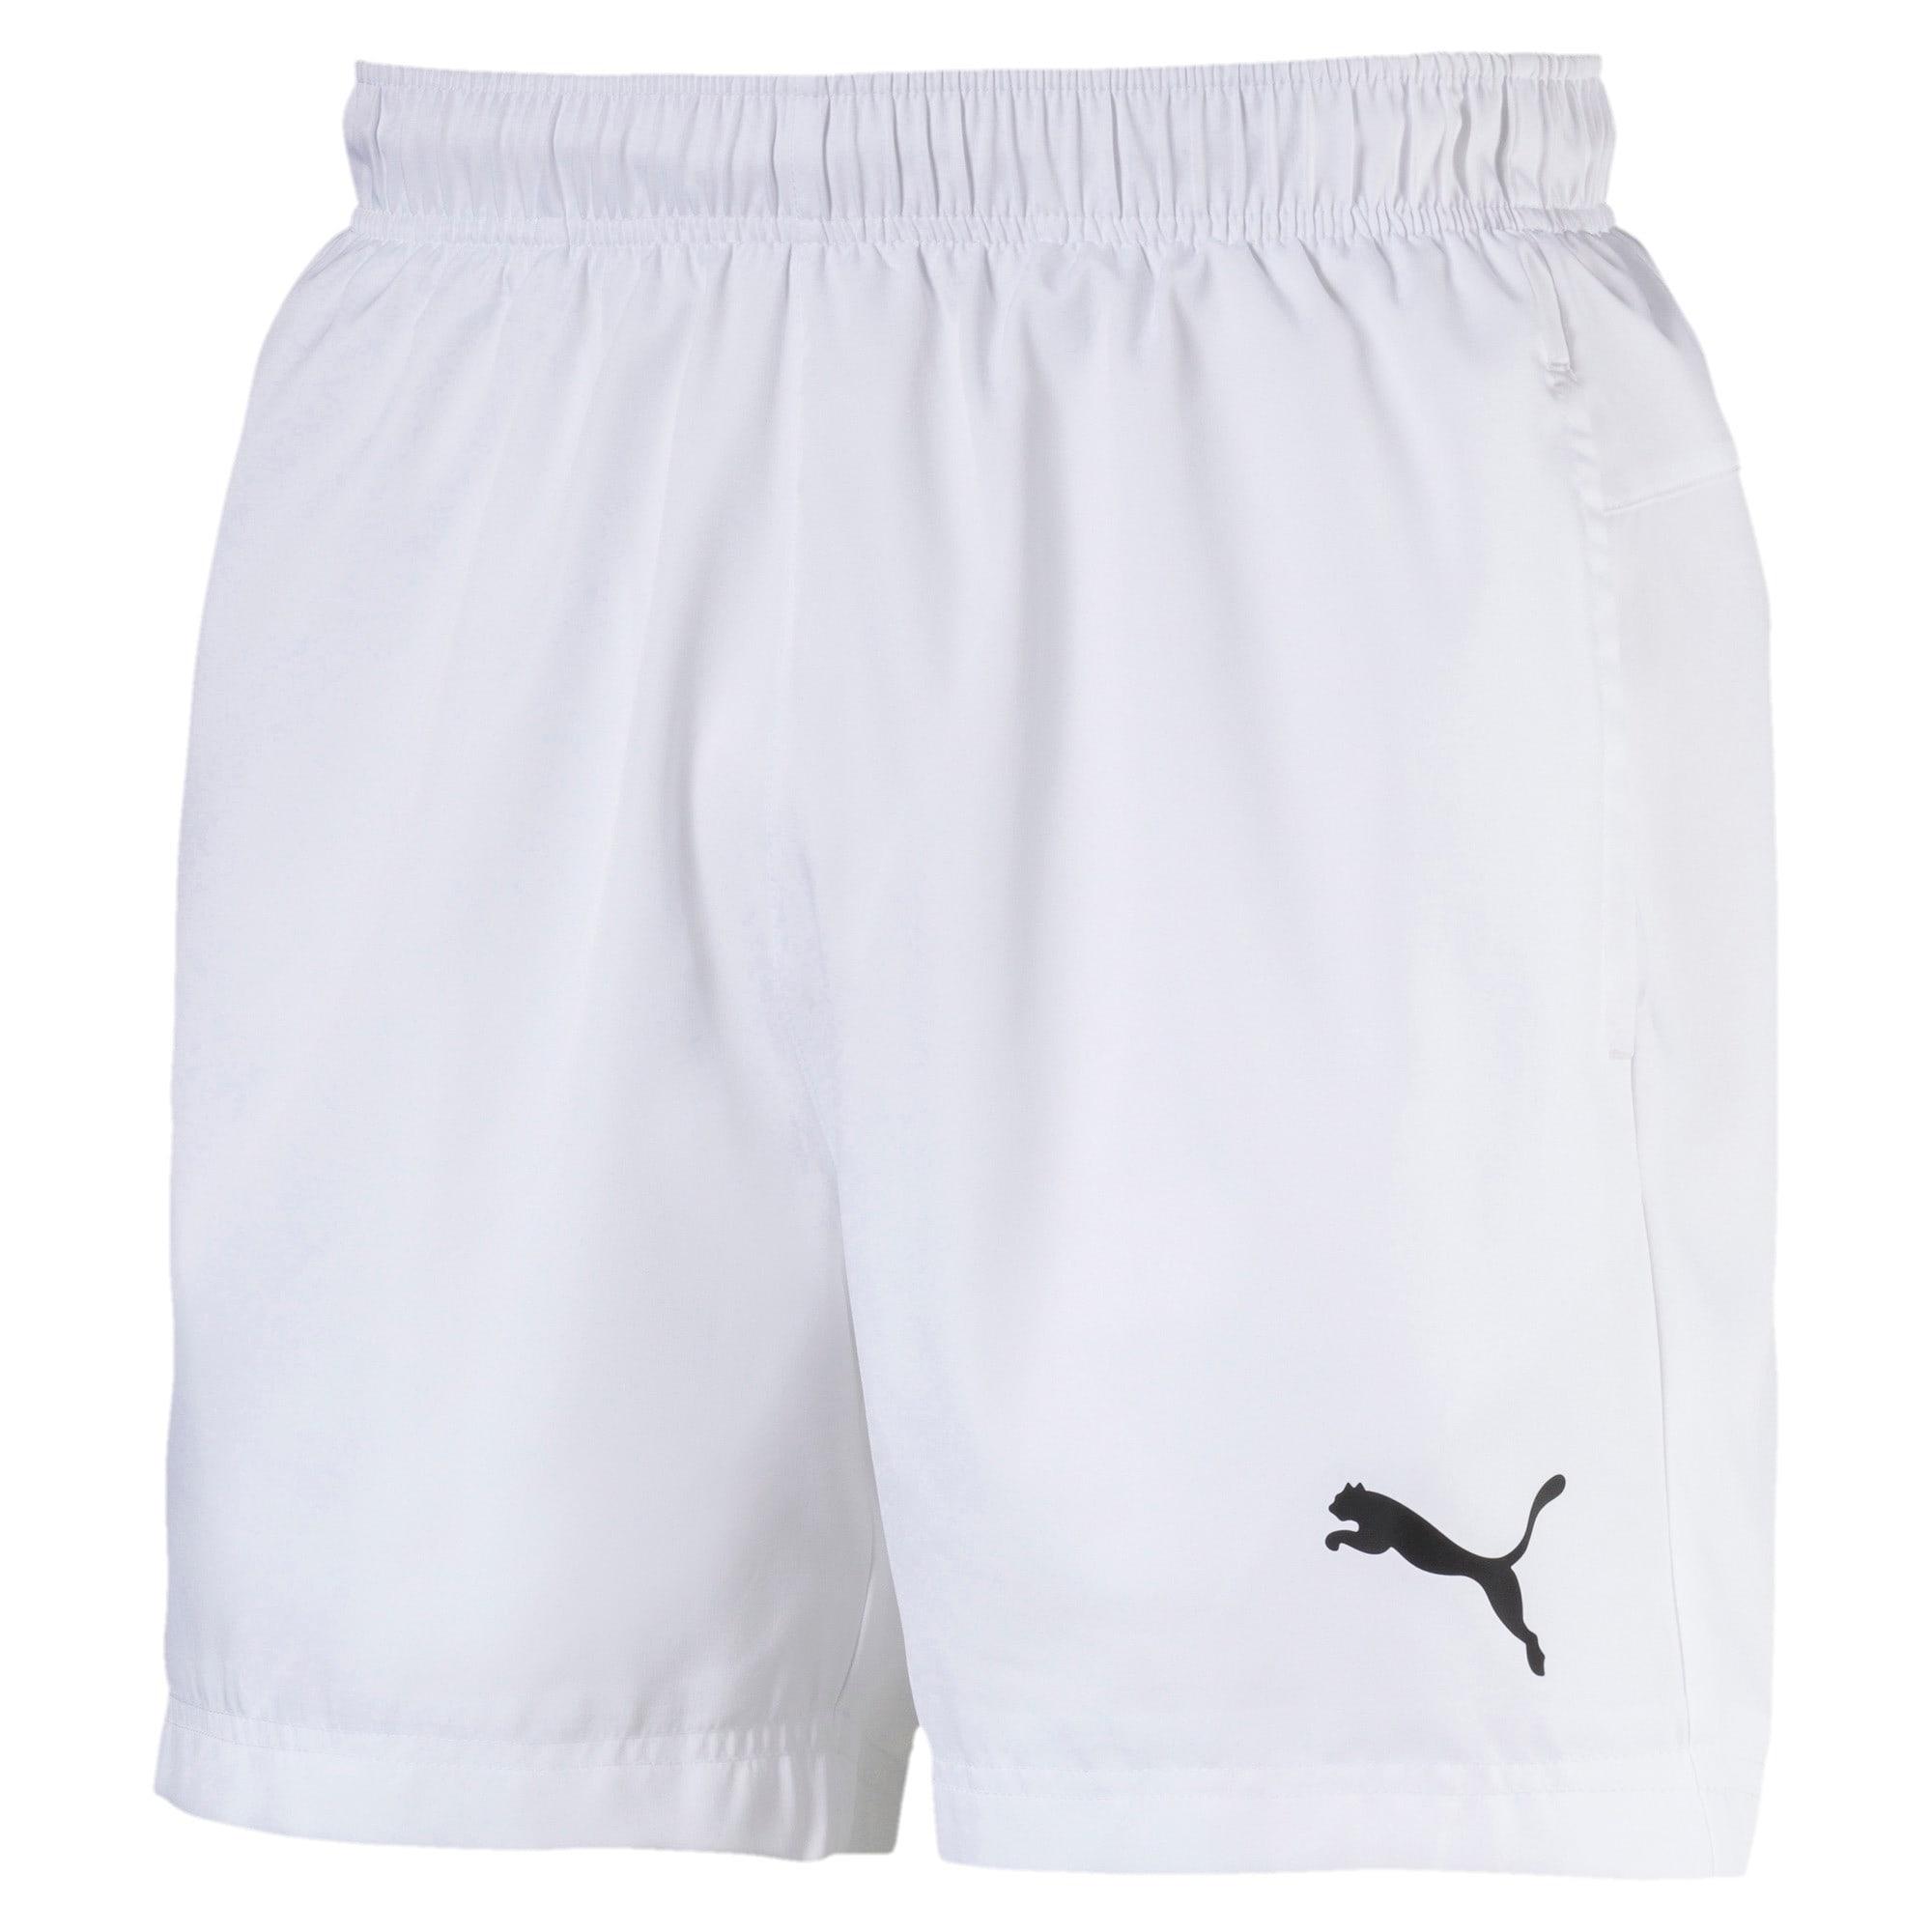 "Thumbnail 1 of Active Woven 5"" Men's Training Shorts, Puma White, medium"